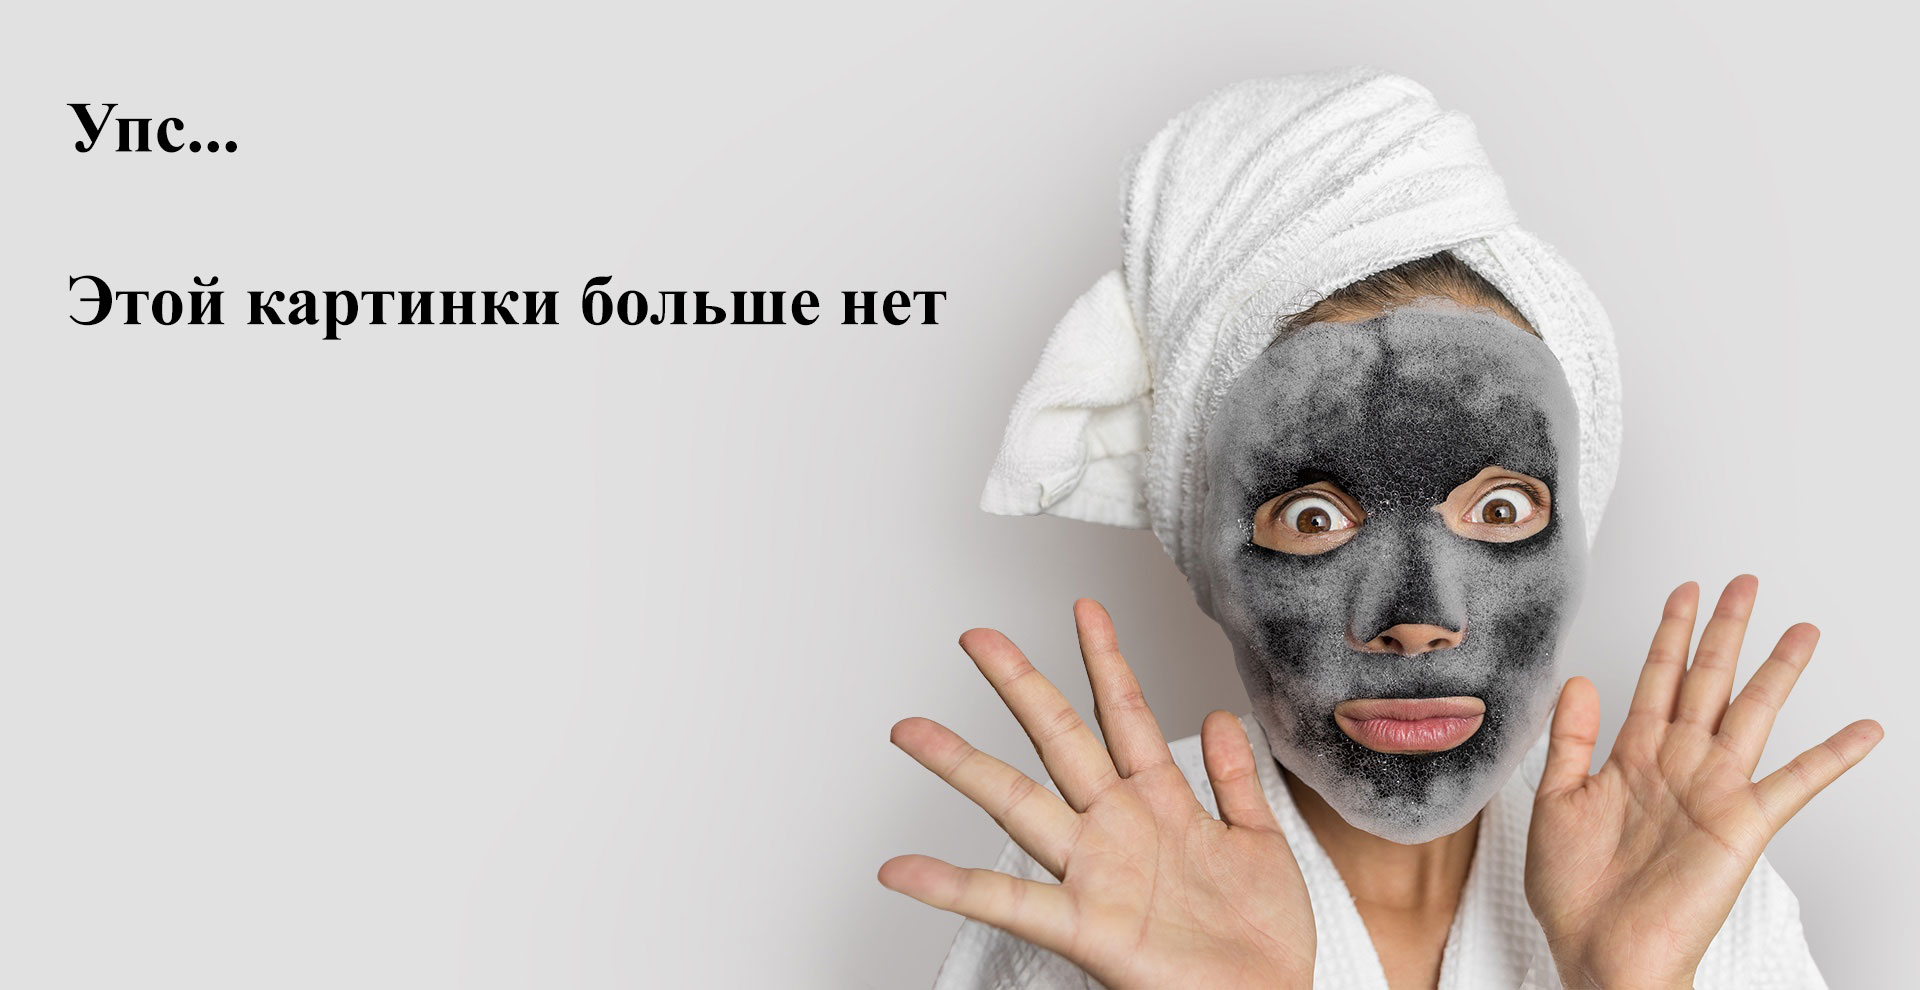 Луи Филипп, Топ для гель-лака Strong No Wipe, 15 мл